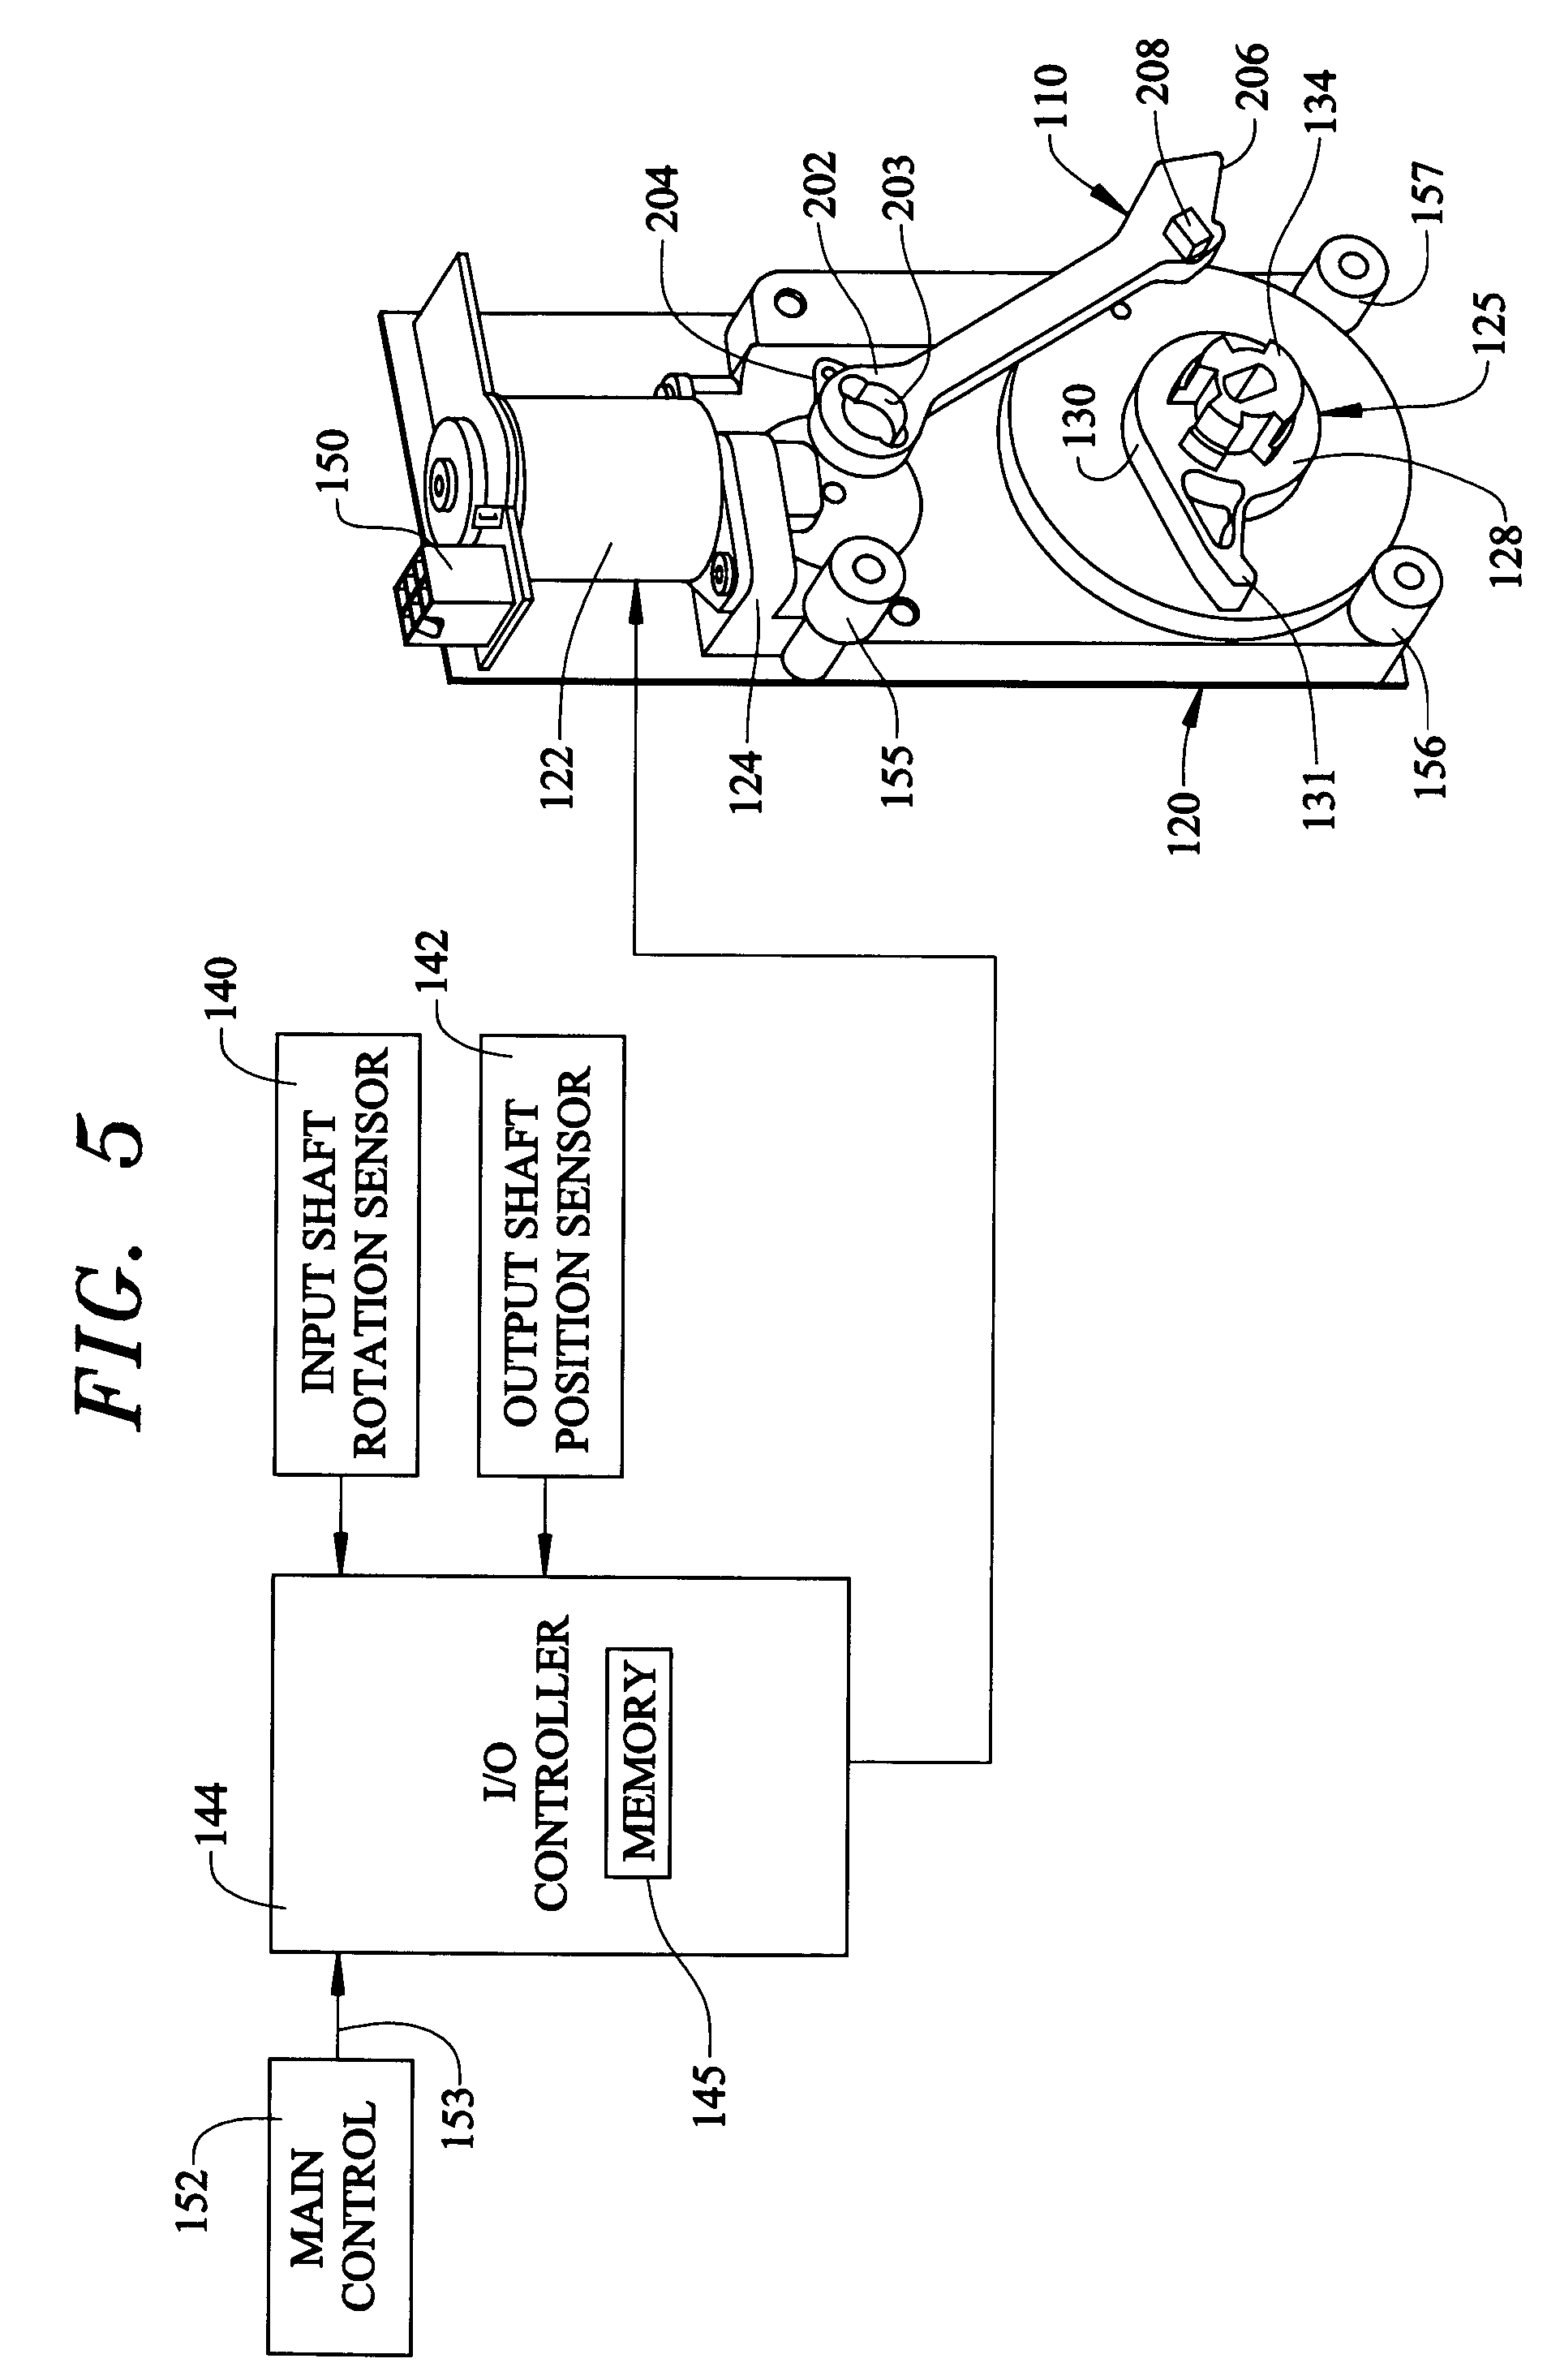 patent us7401710 - vending machine dispensing system